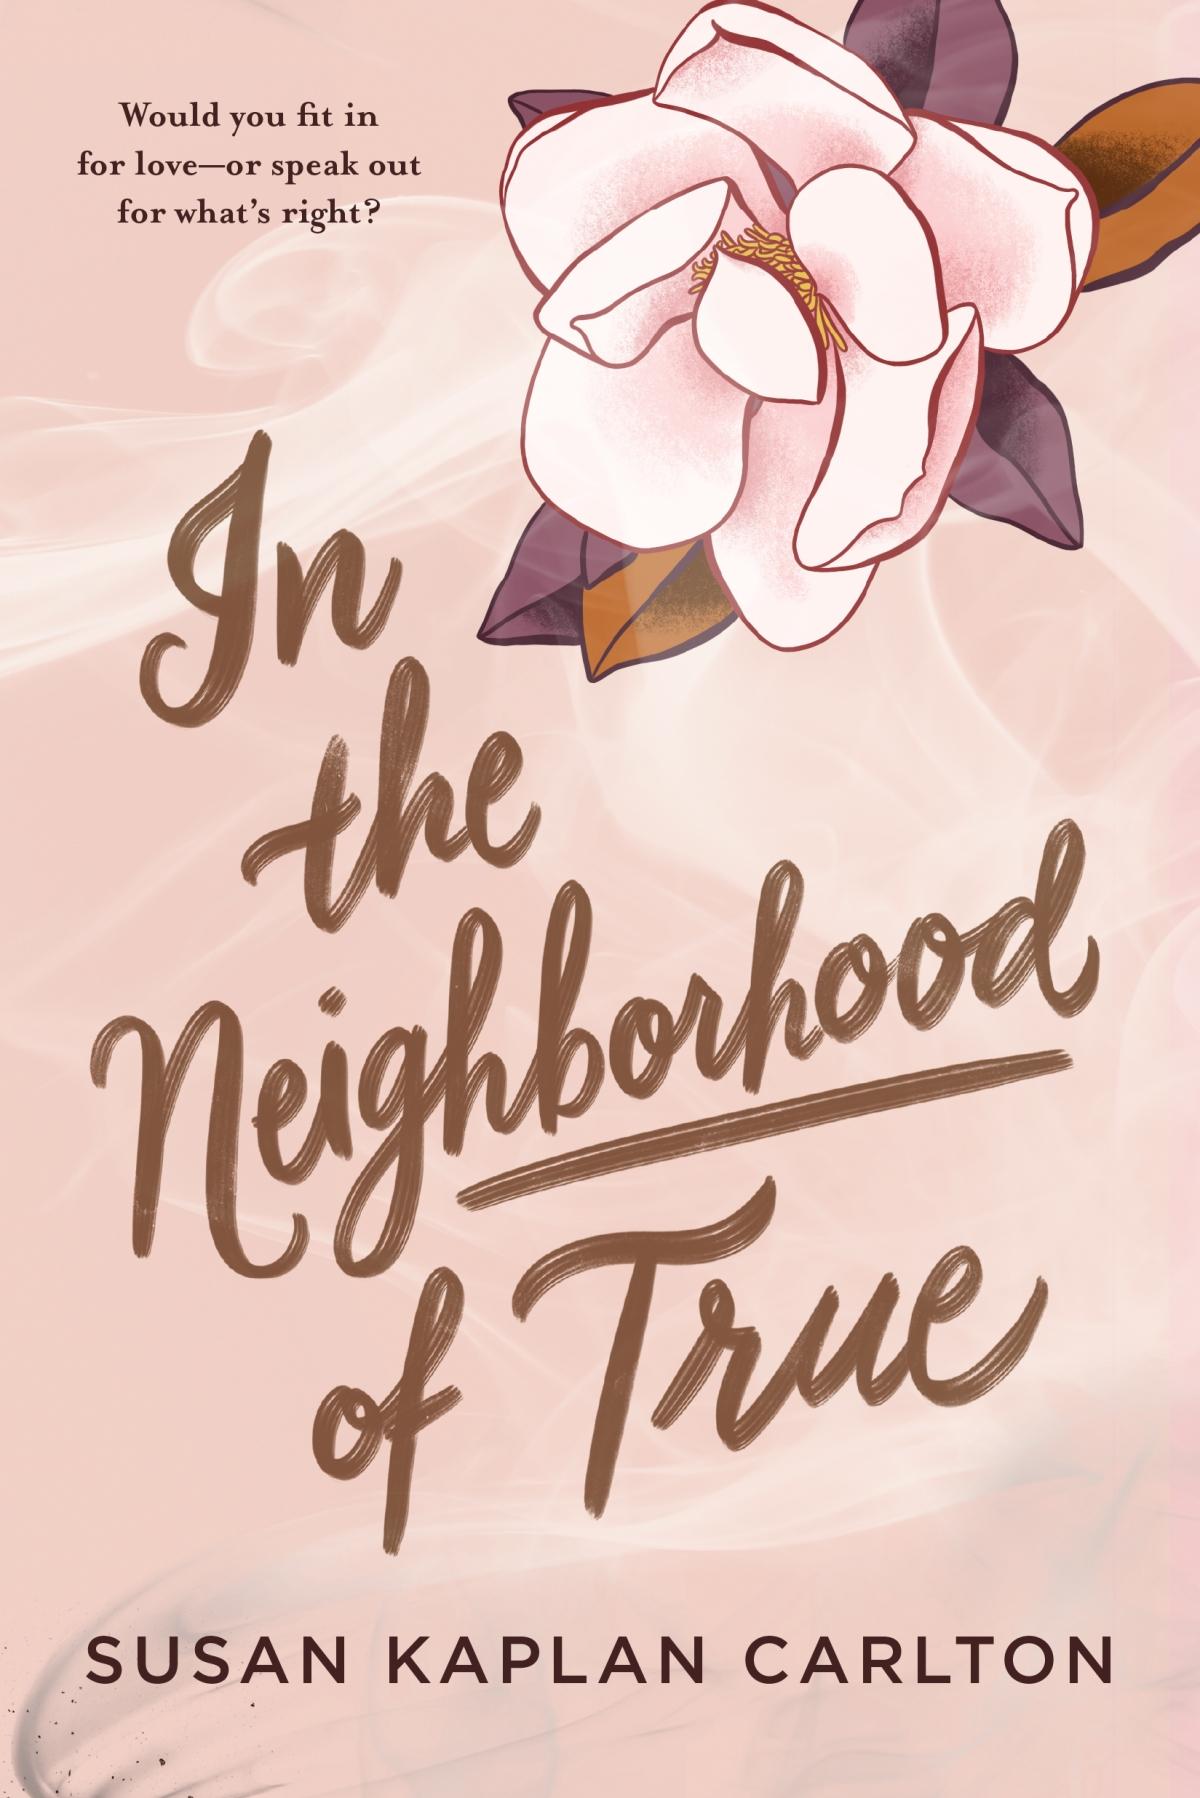 Blog Tour: In The Neighborhood of True by Susan KaplanCarlton